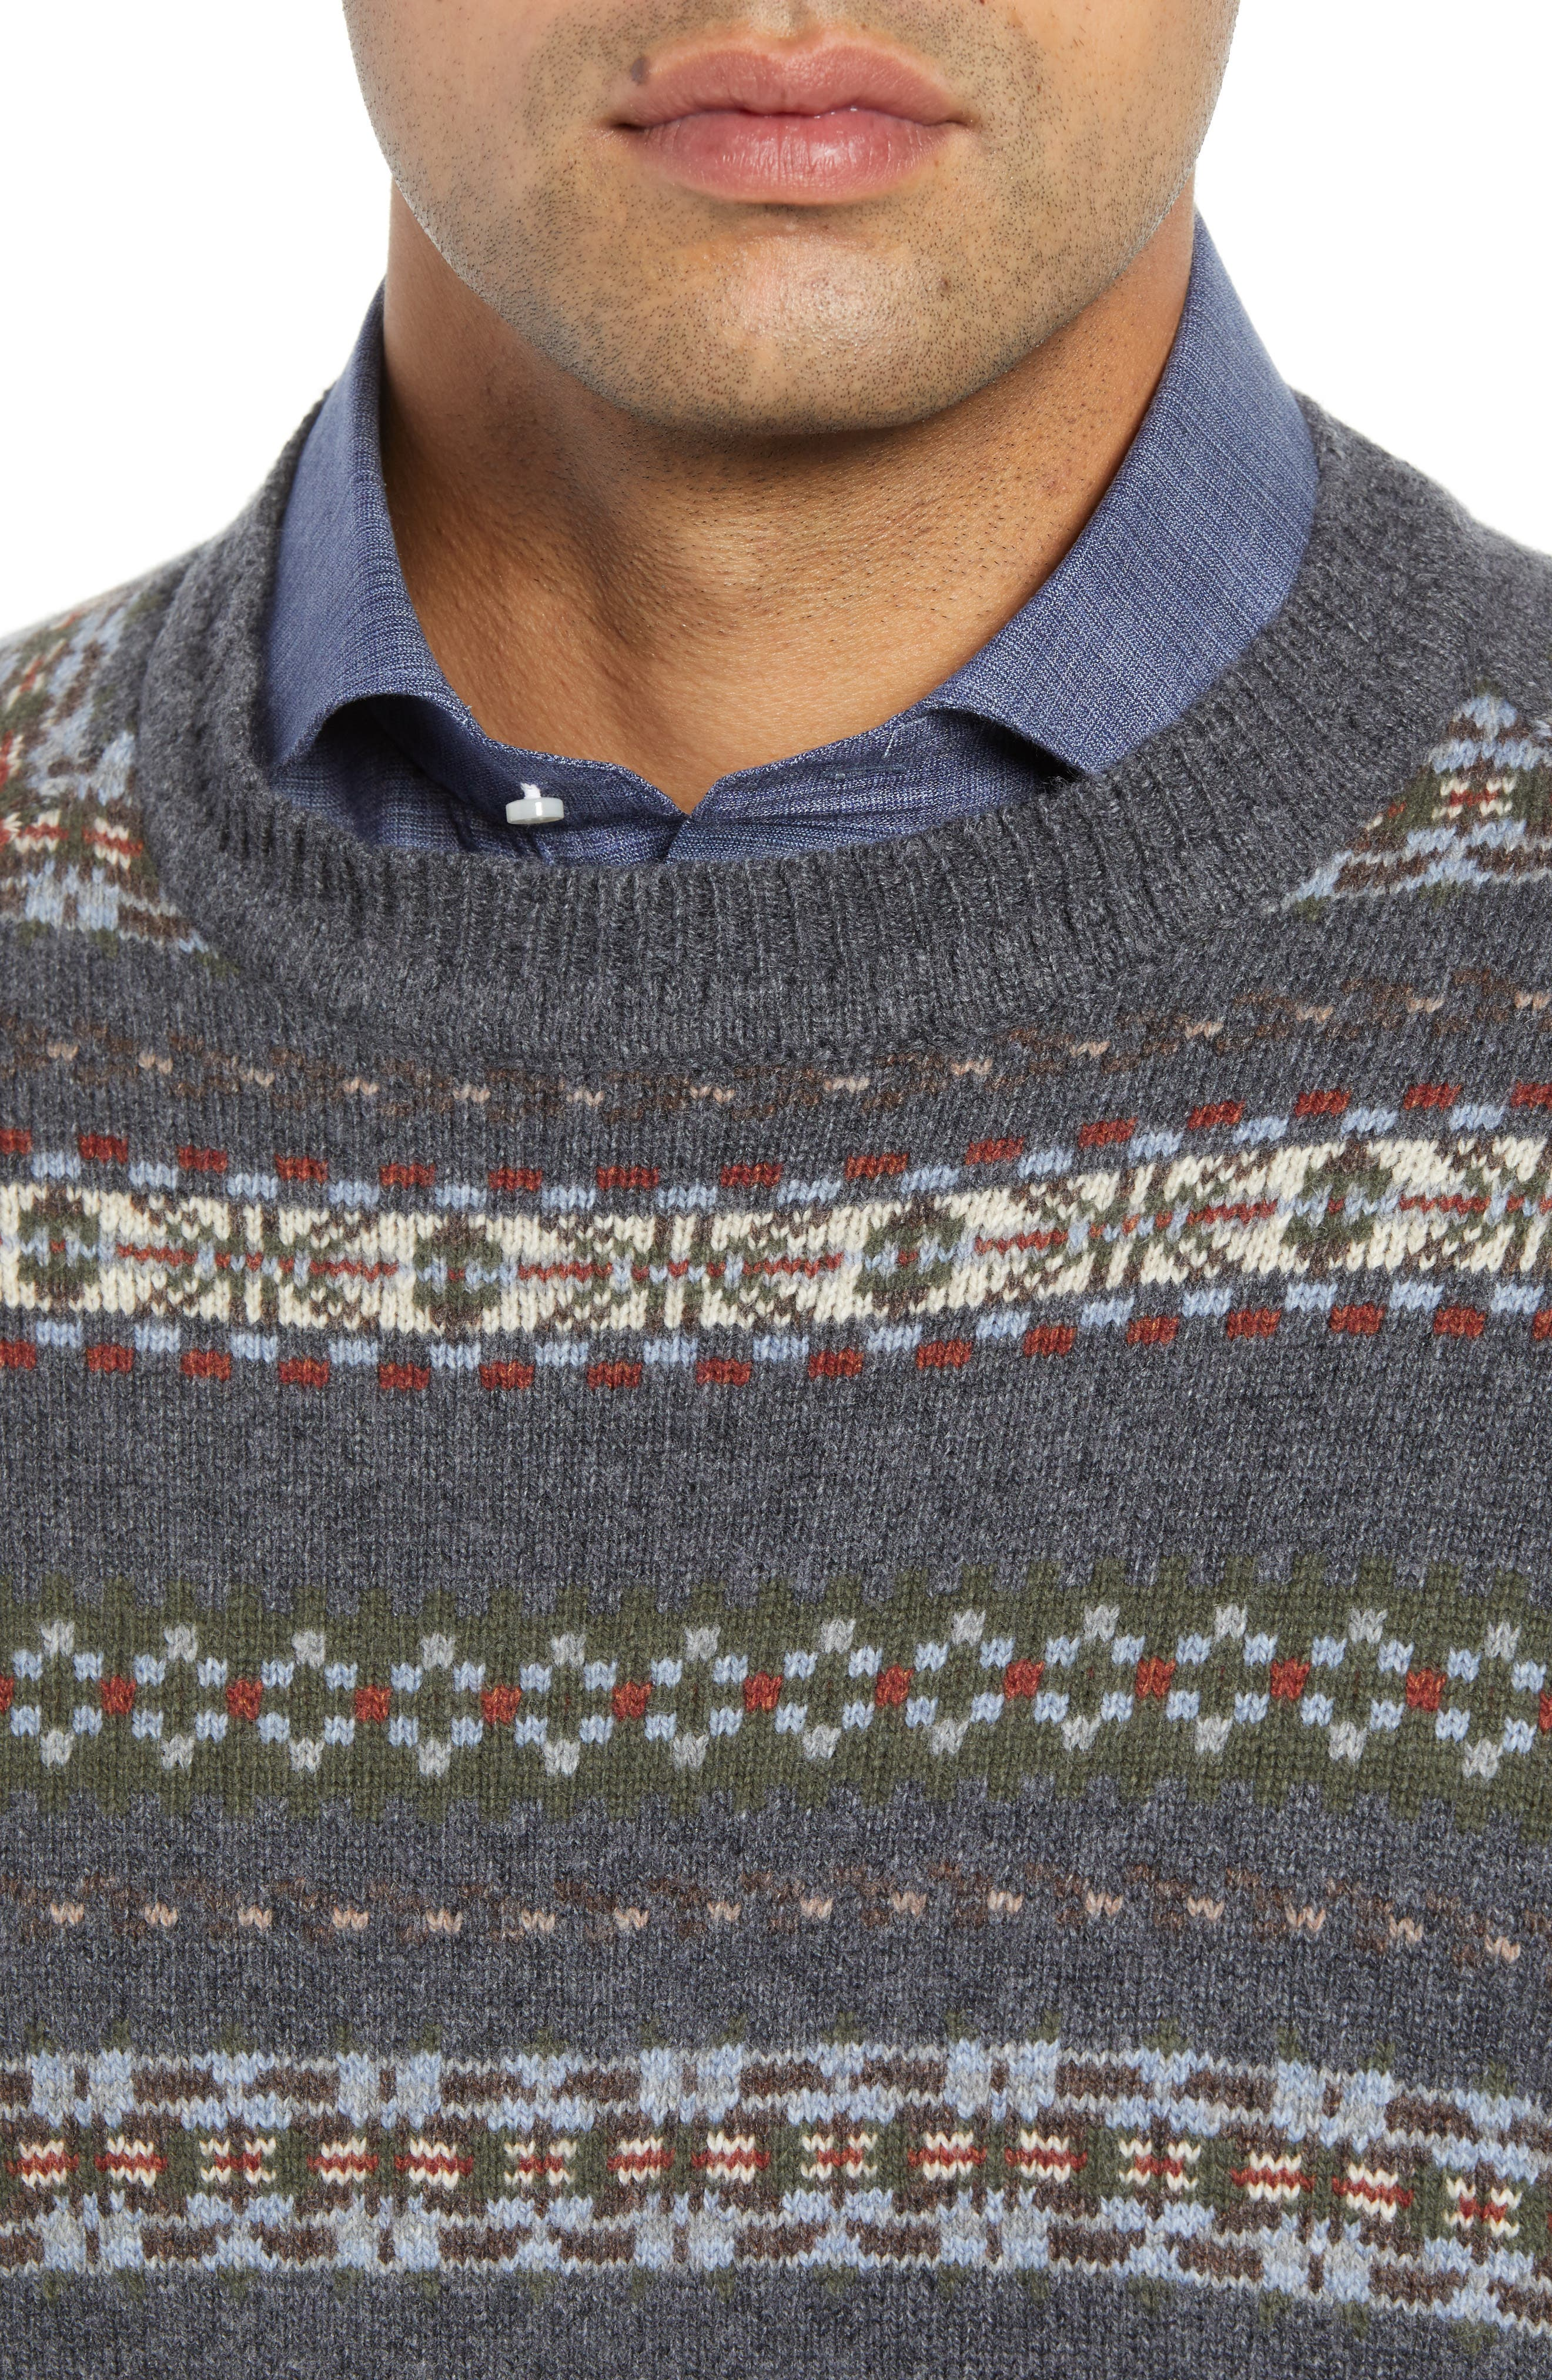 Mountainside Fair Isle Crewneck Sweater,                             Alternate thumbnail 4, color,                             017